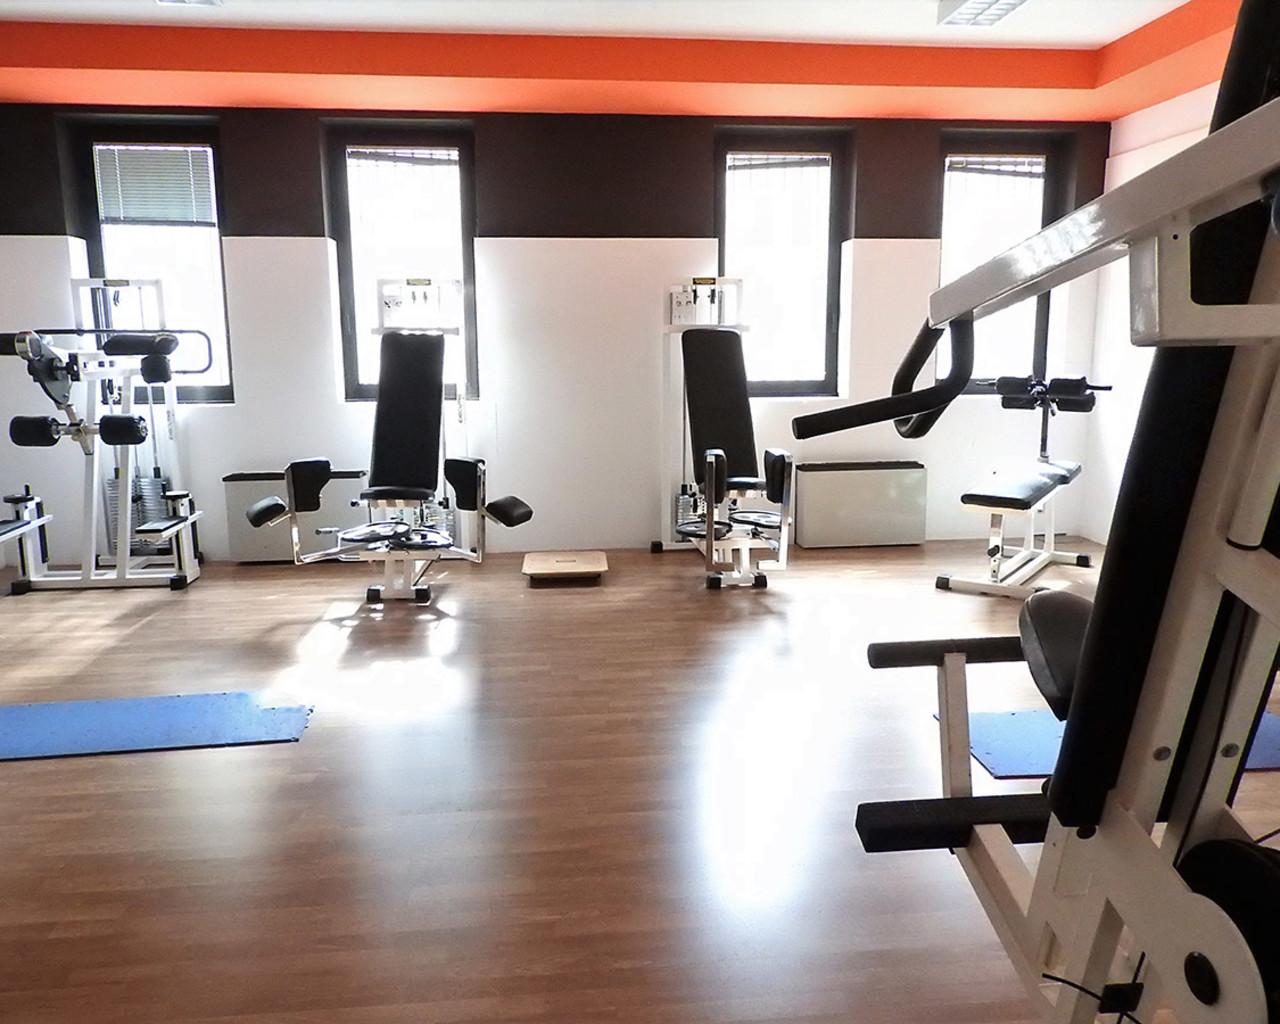 Unika Centro Wellness